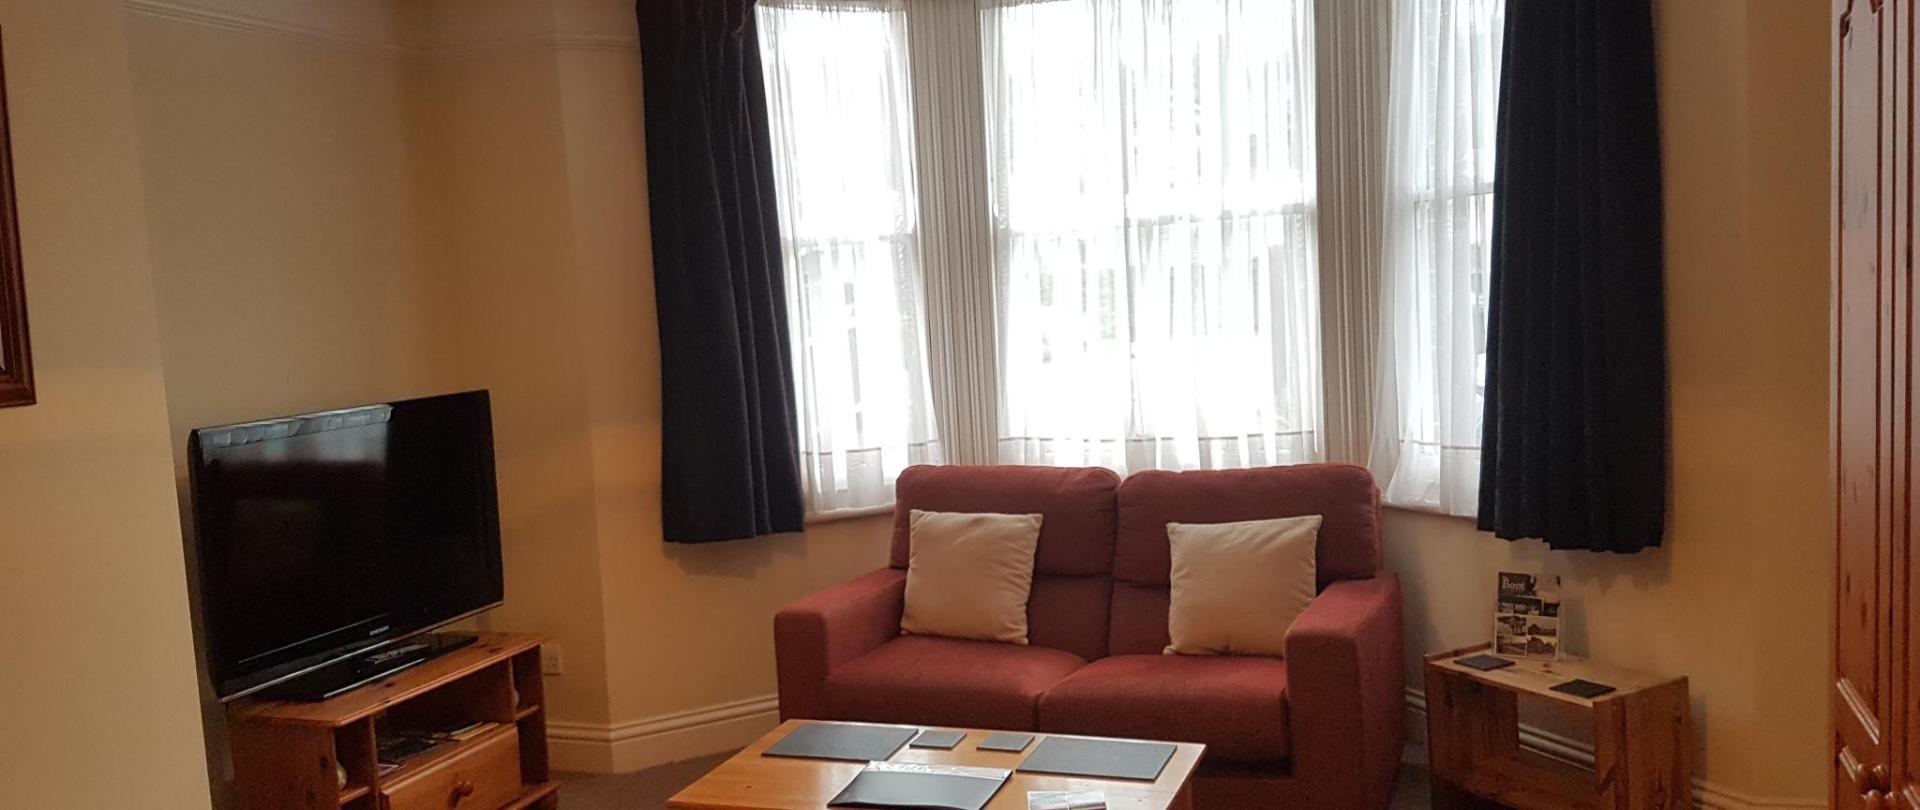 Studio Lounge 251118.jpg